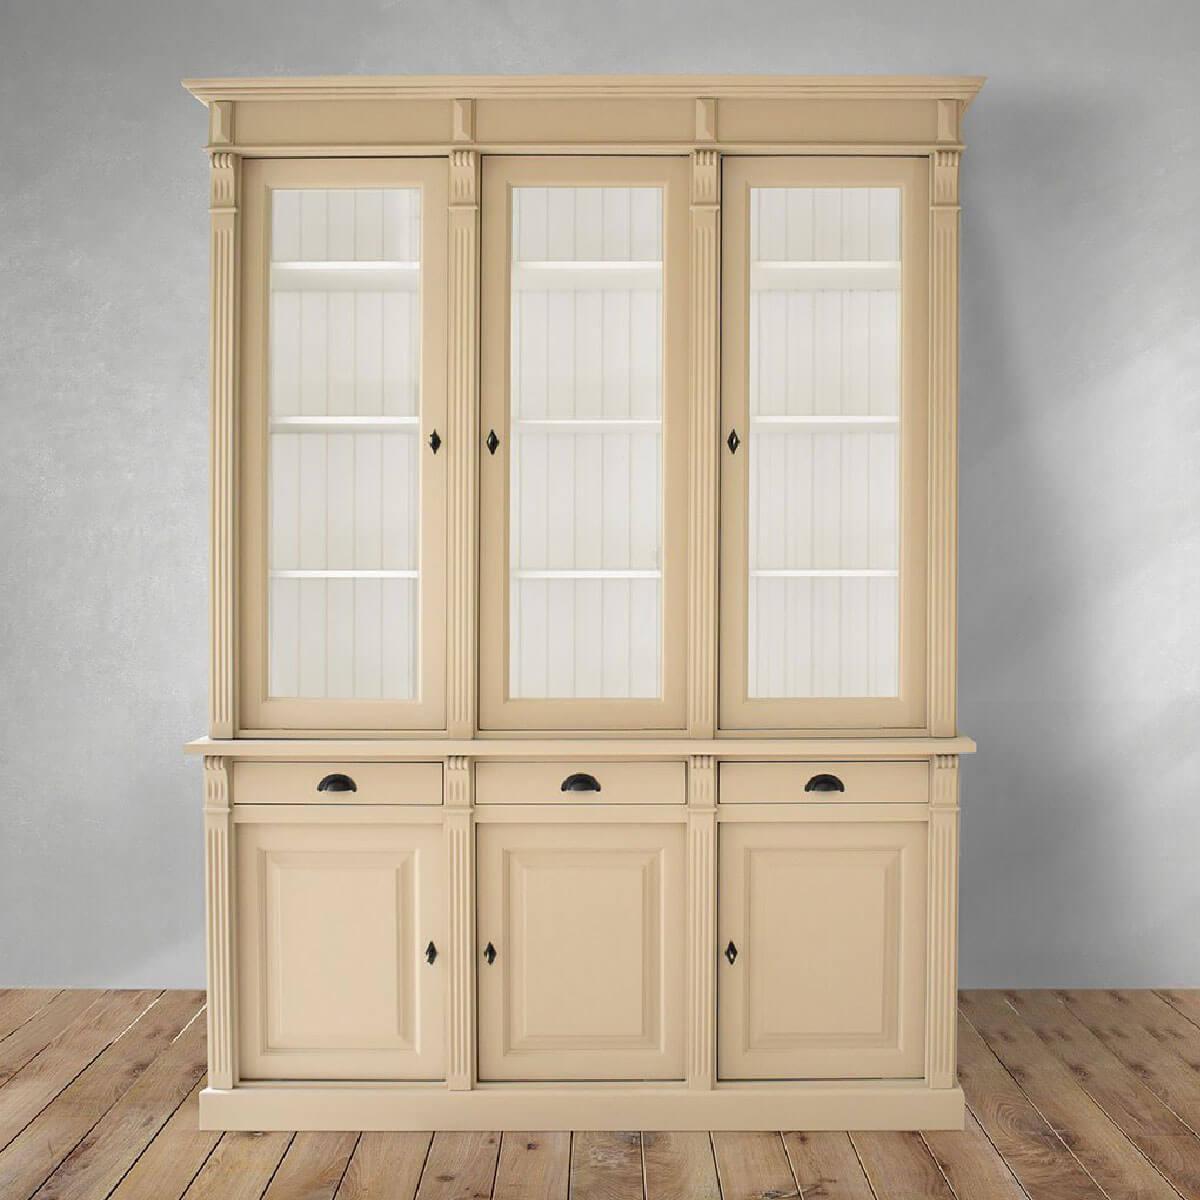 James-Cabinet-in-Beige-Cozy-Home-Dubai1